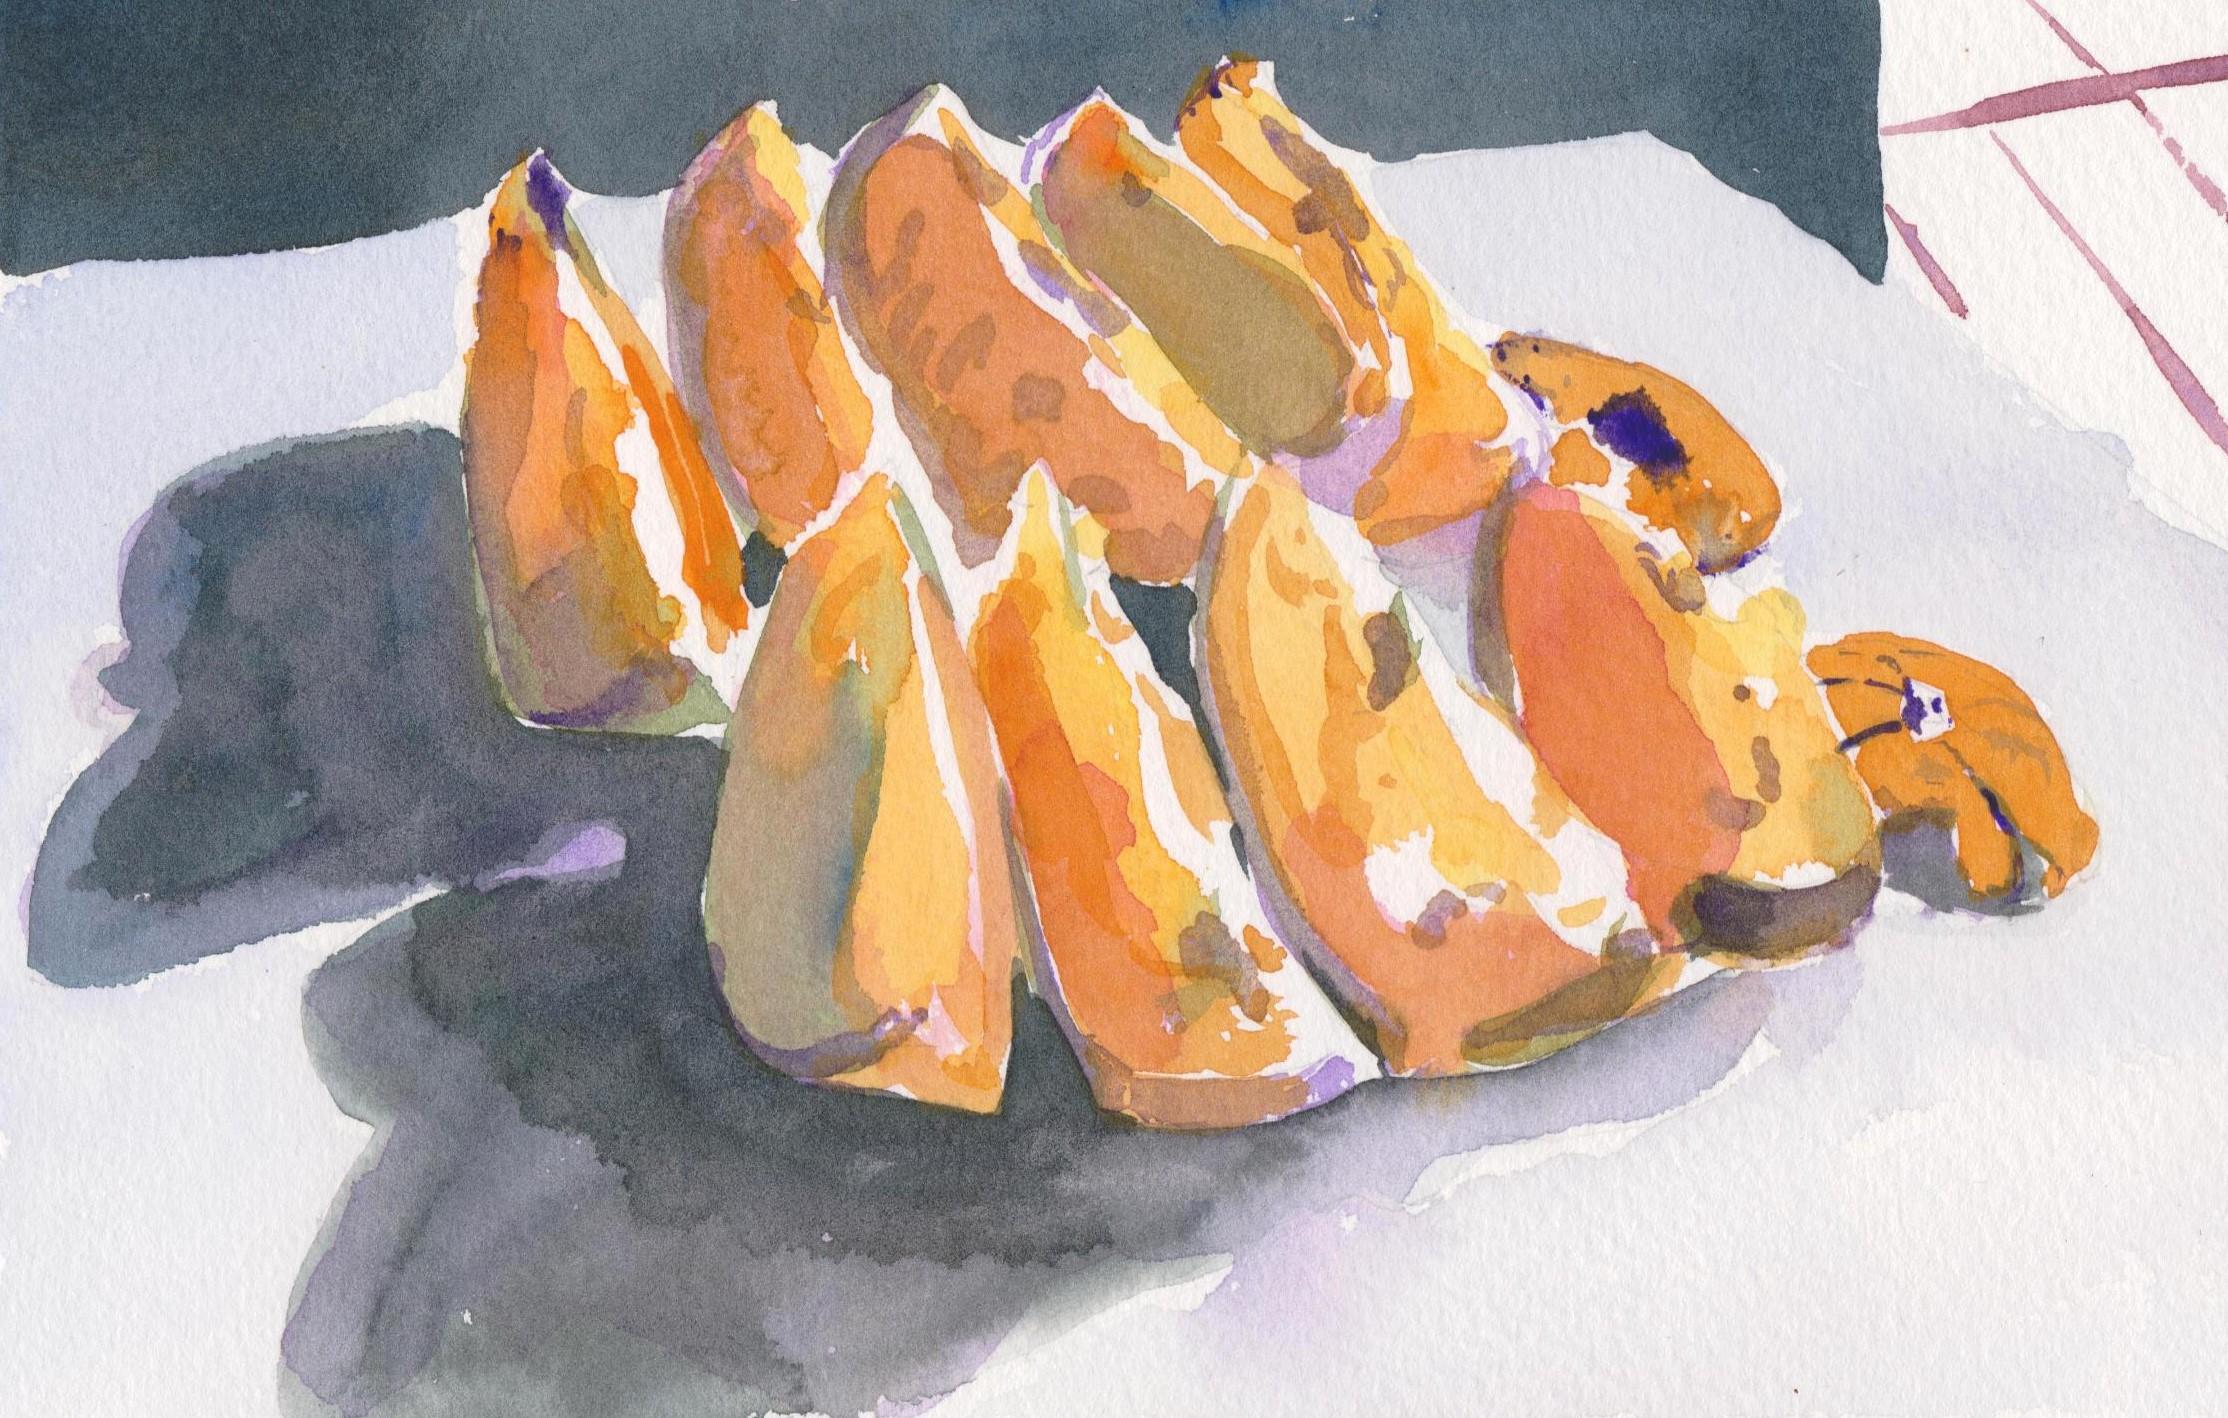 Watercolour sketch of orange slices, Girona, spain